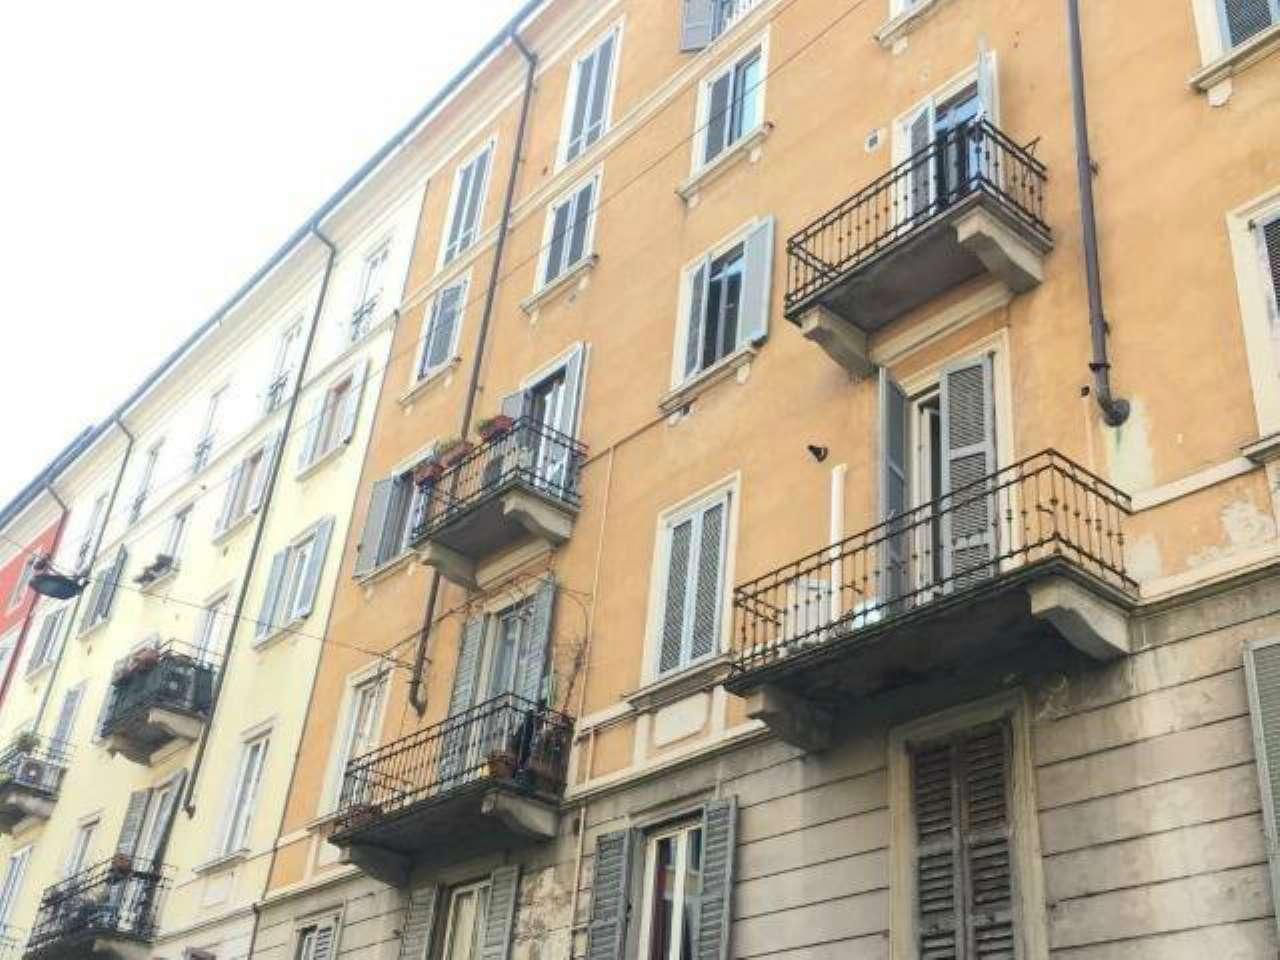 Monolocale In Vendita A Milano Zona 10 Pta Genova Romolo Solari Savona Tortona